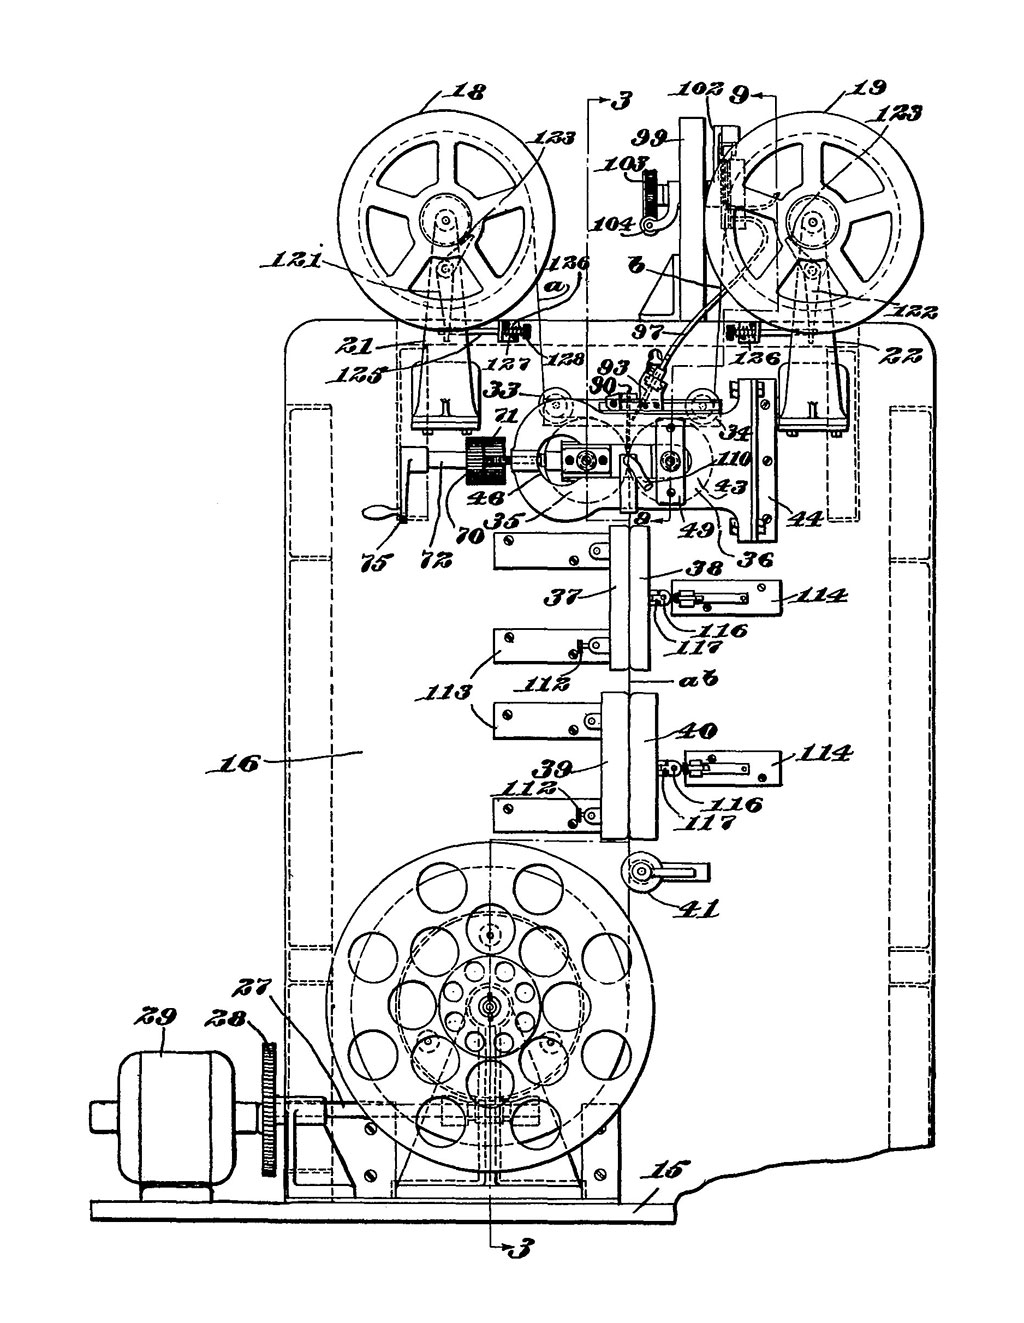 Pyramid radio wiring diagram new wiring diagram 2018